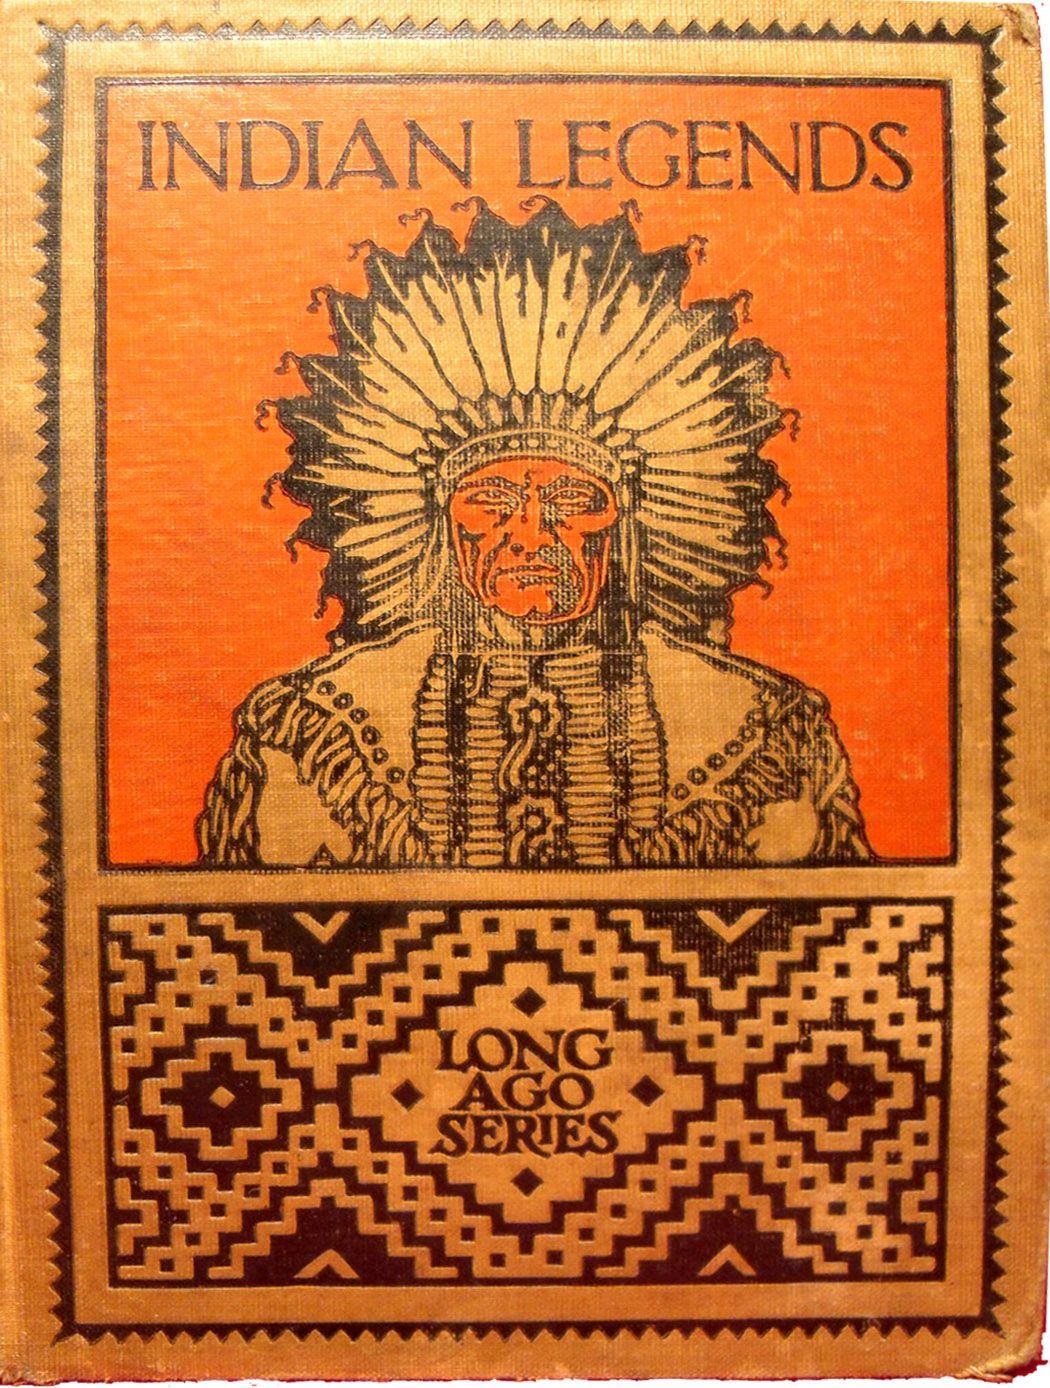 Native American Indian Legends